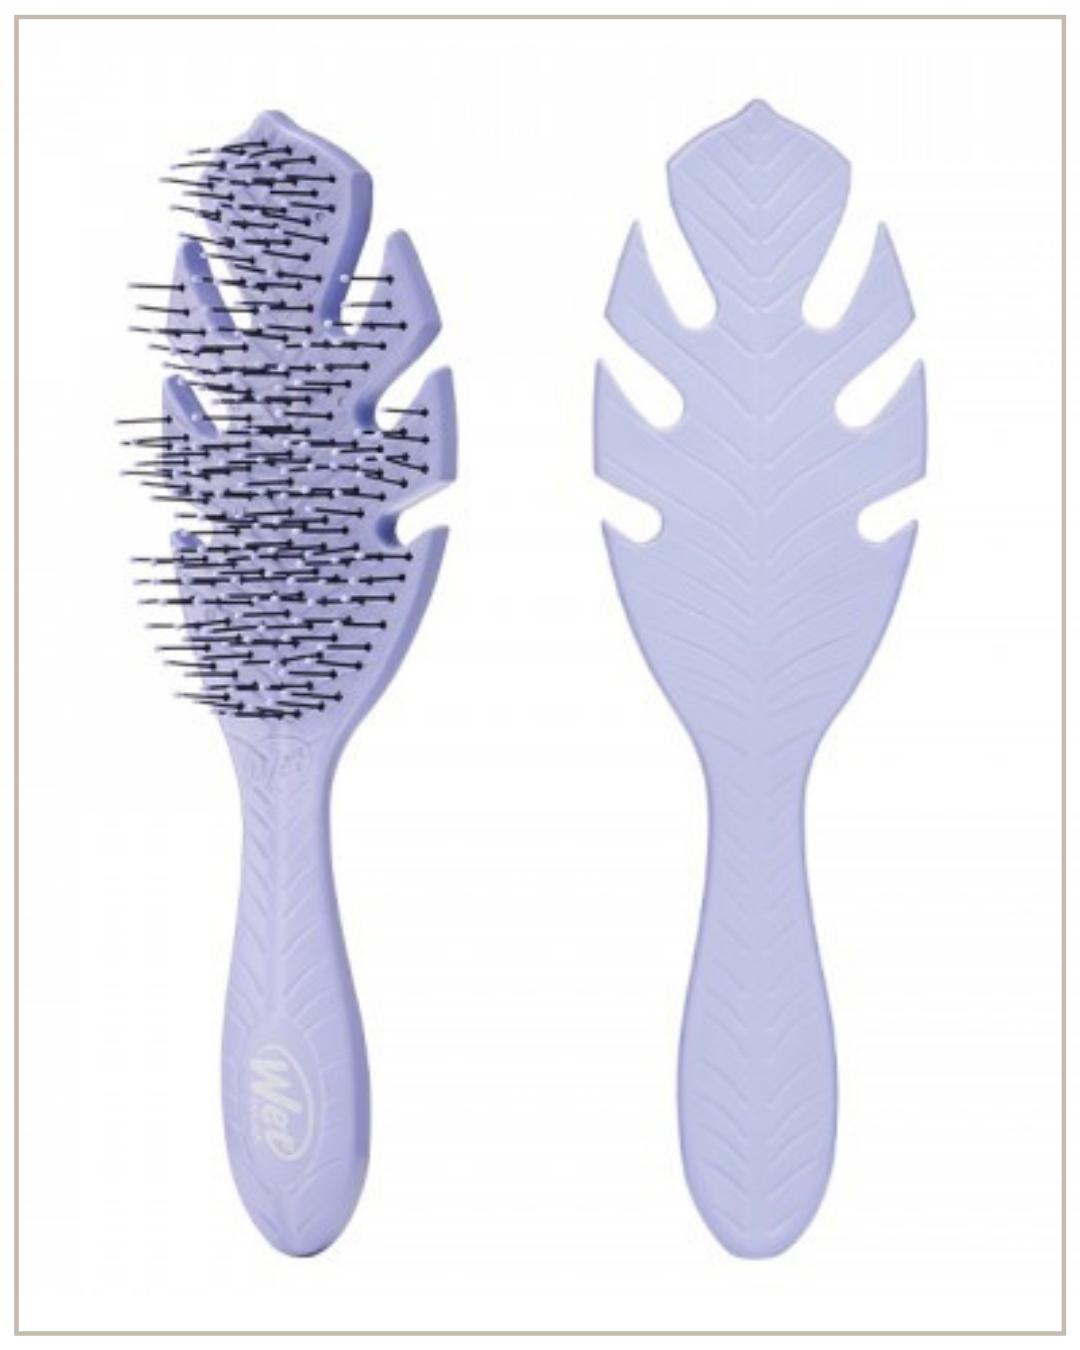 Wetbrush go green detangler lavendar biologiškai suyrantis plaukų šepetys